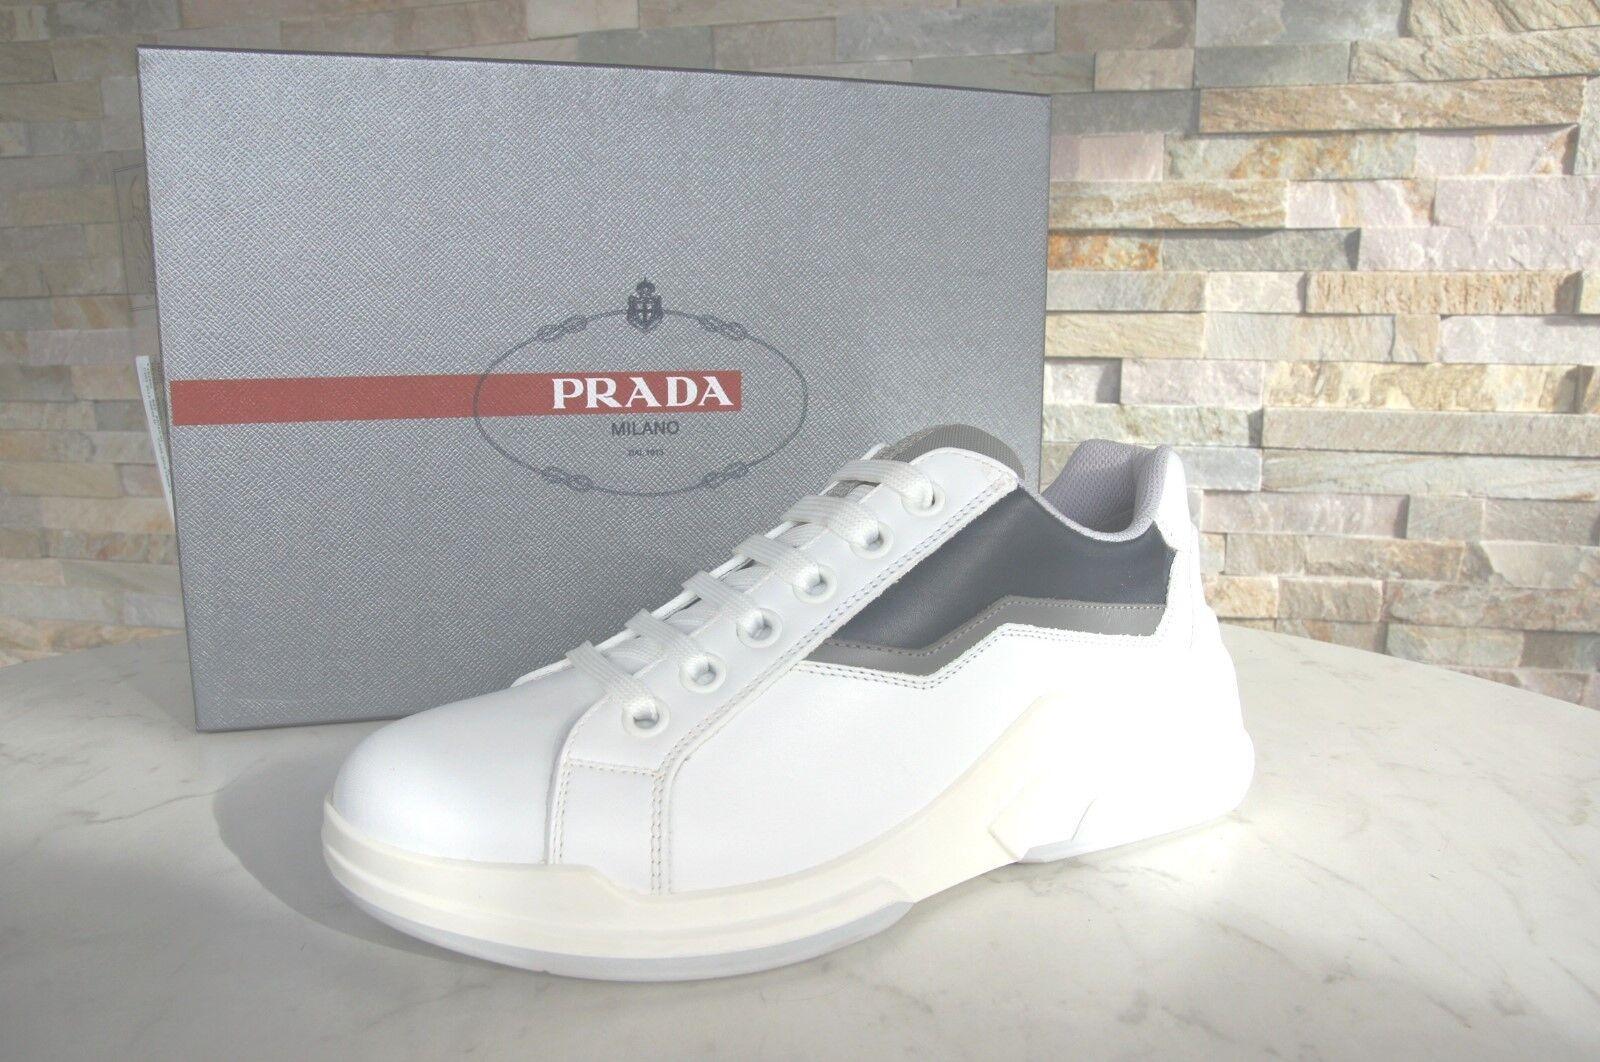 luxus PRADA Gr 39 5 Herren Sneakers Schuhe shoes weiß blau grau NEU UVP 550